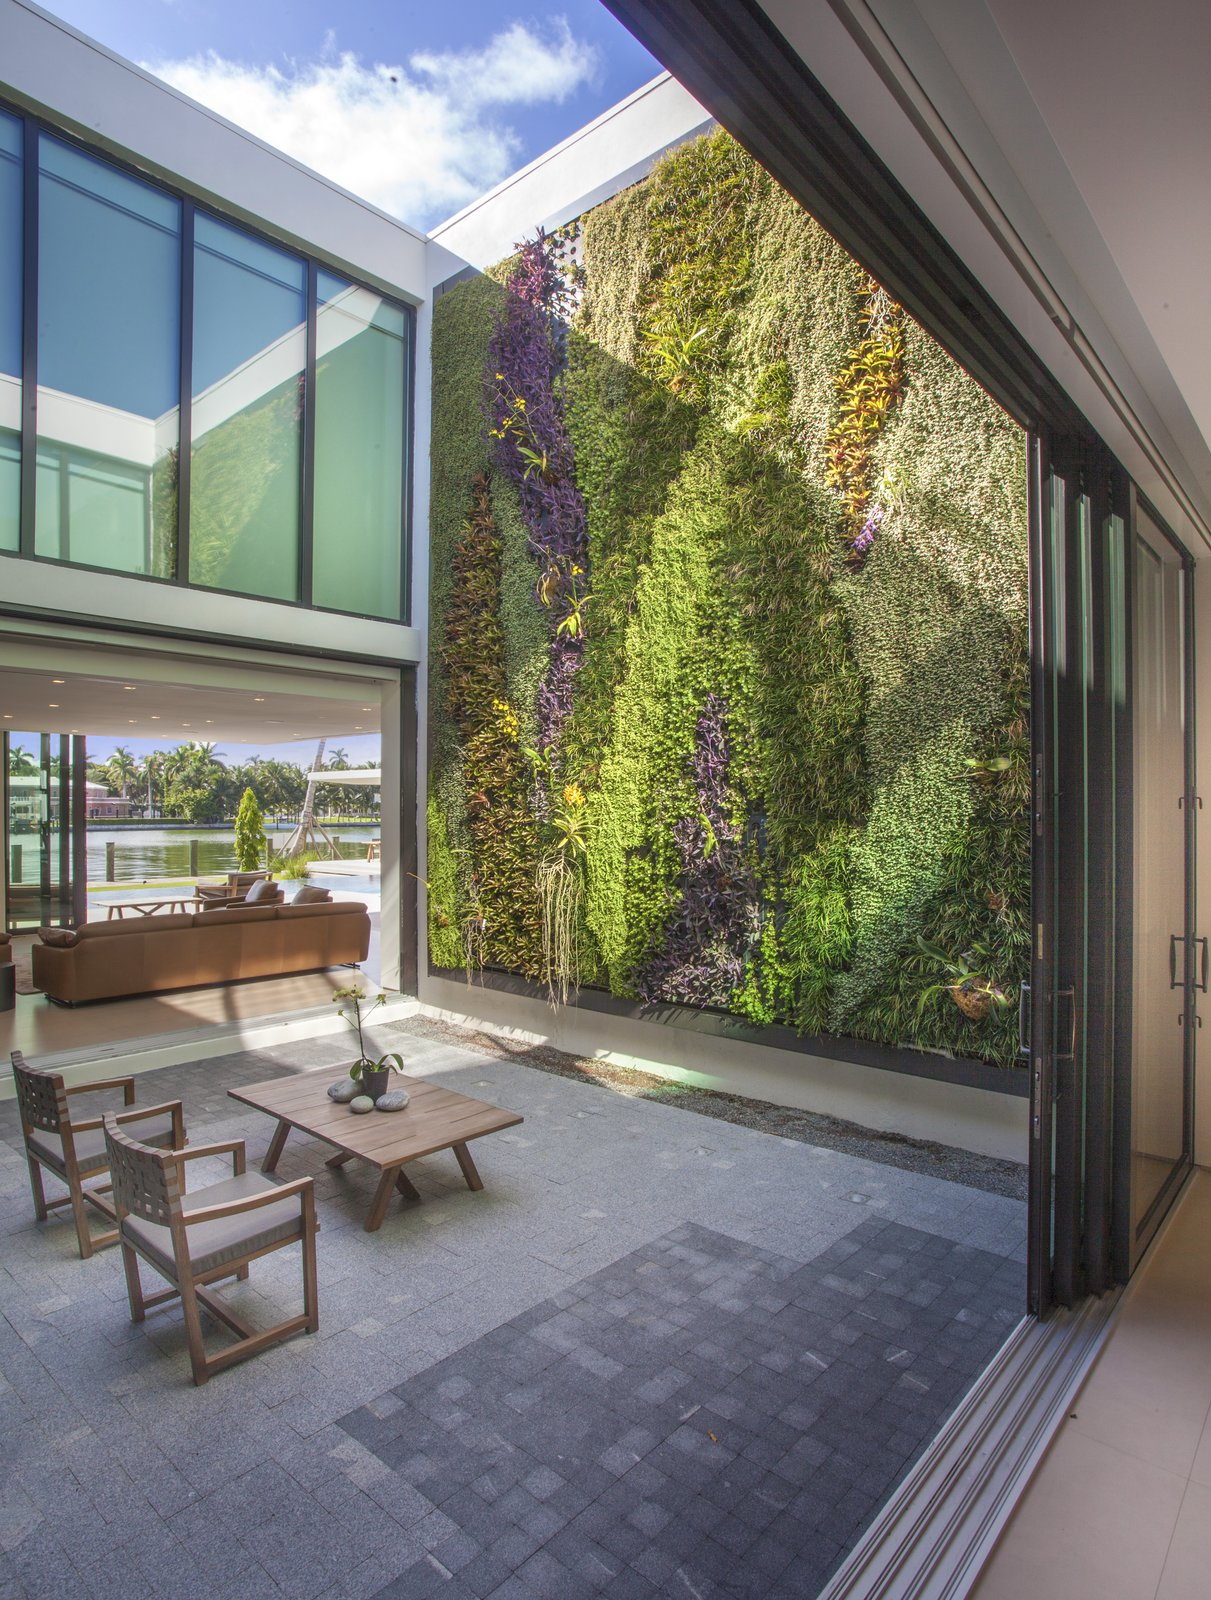 Atrium Allison Road Residence by Choeff Levy Fischman